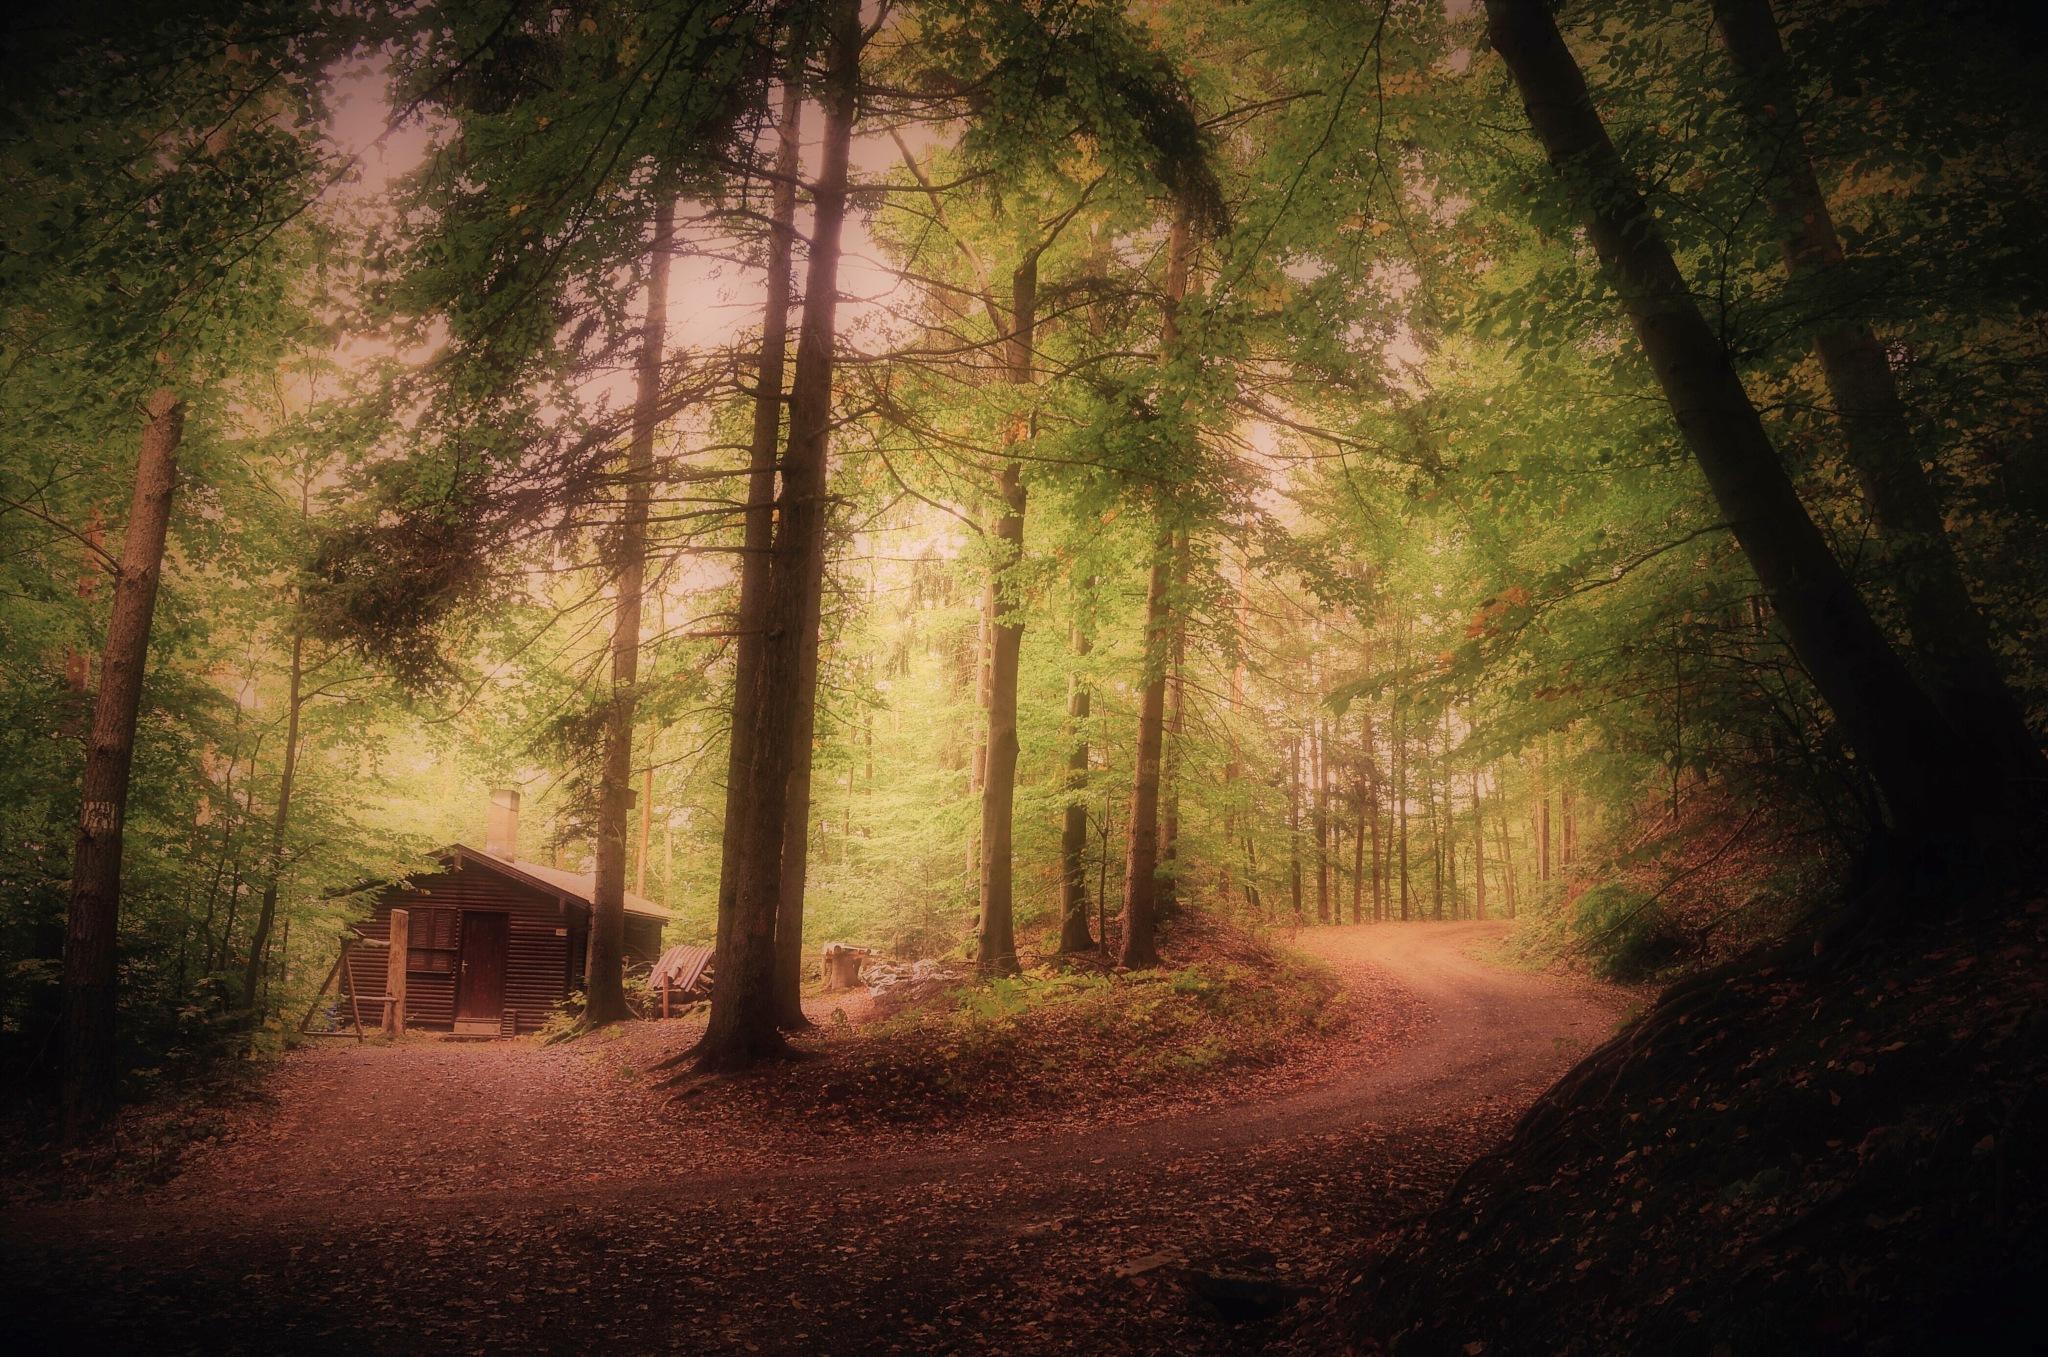 Hidden in the Woods  by Stoica Emilian